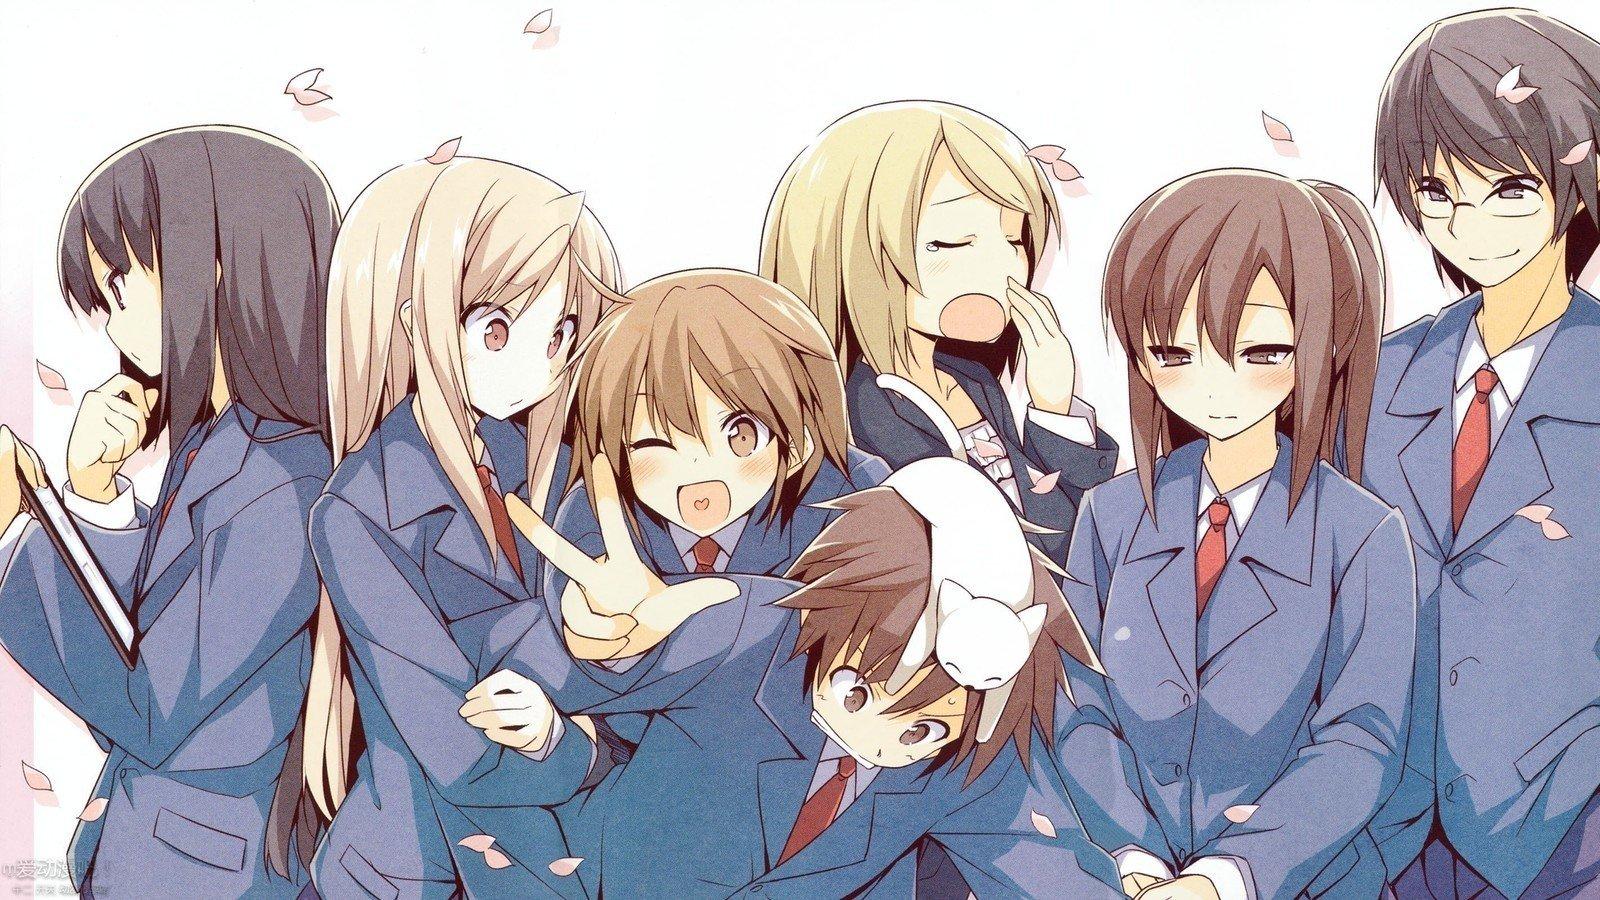 Petition · Make Sakurasou no Pet na Kanojo season 9! · Change.org